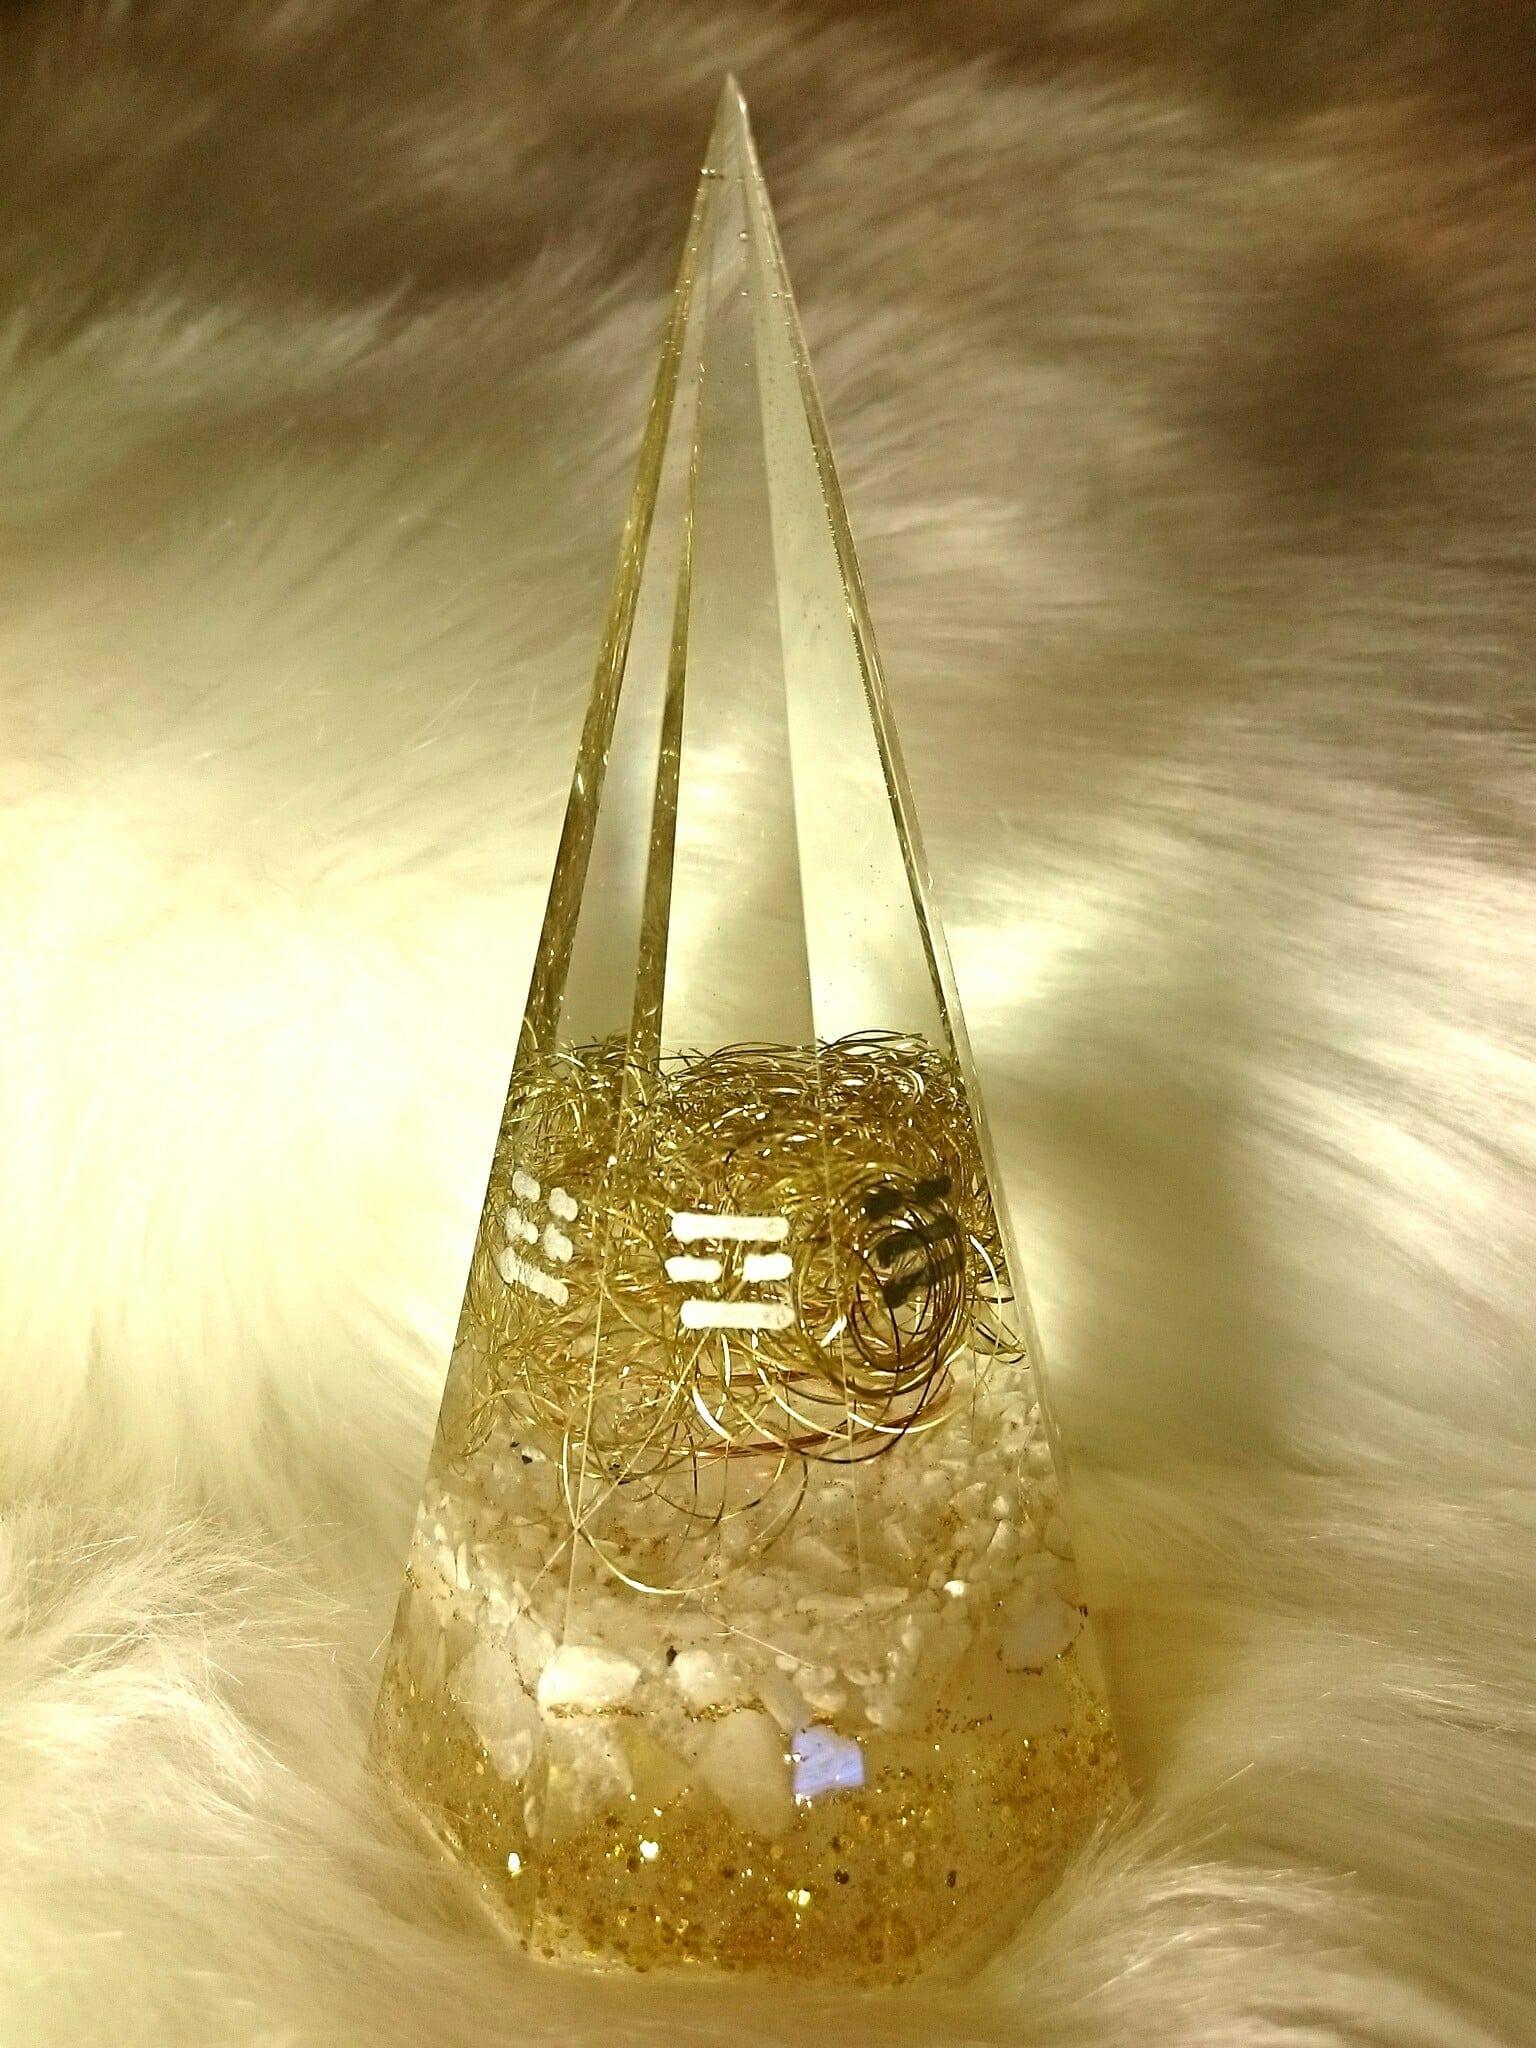 Hiro✡オリジナル オルゴナイト〜Orgonite〜八角錐